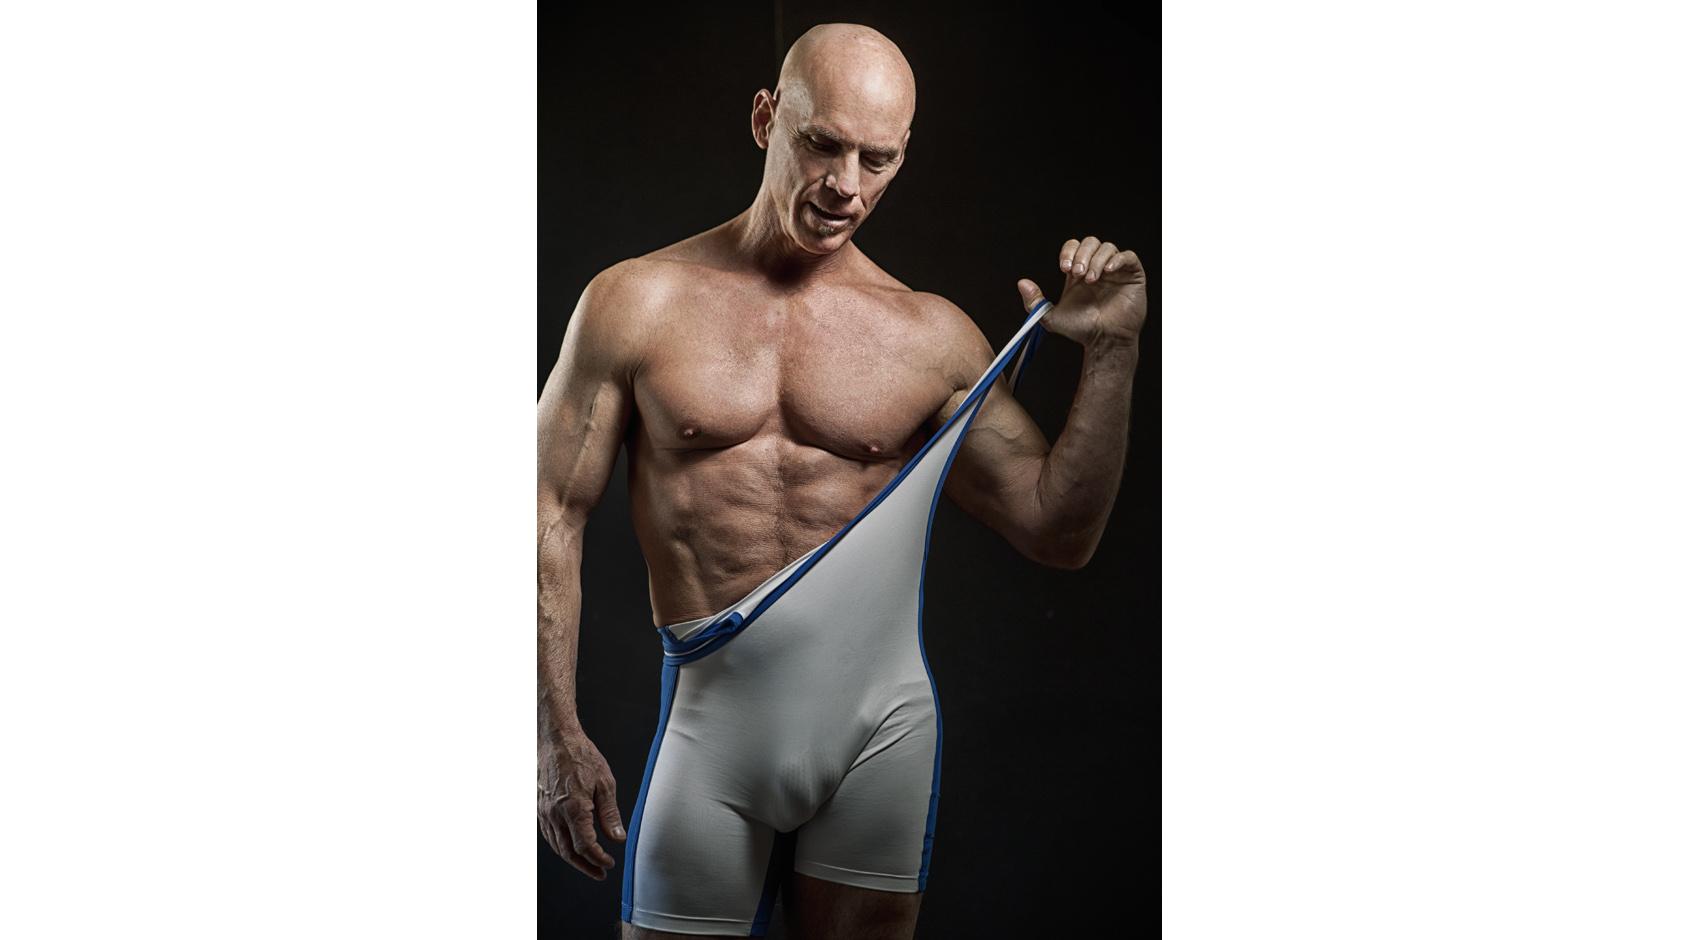 Men Over 50 - Chuck